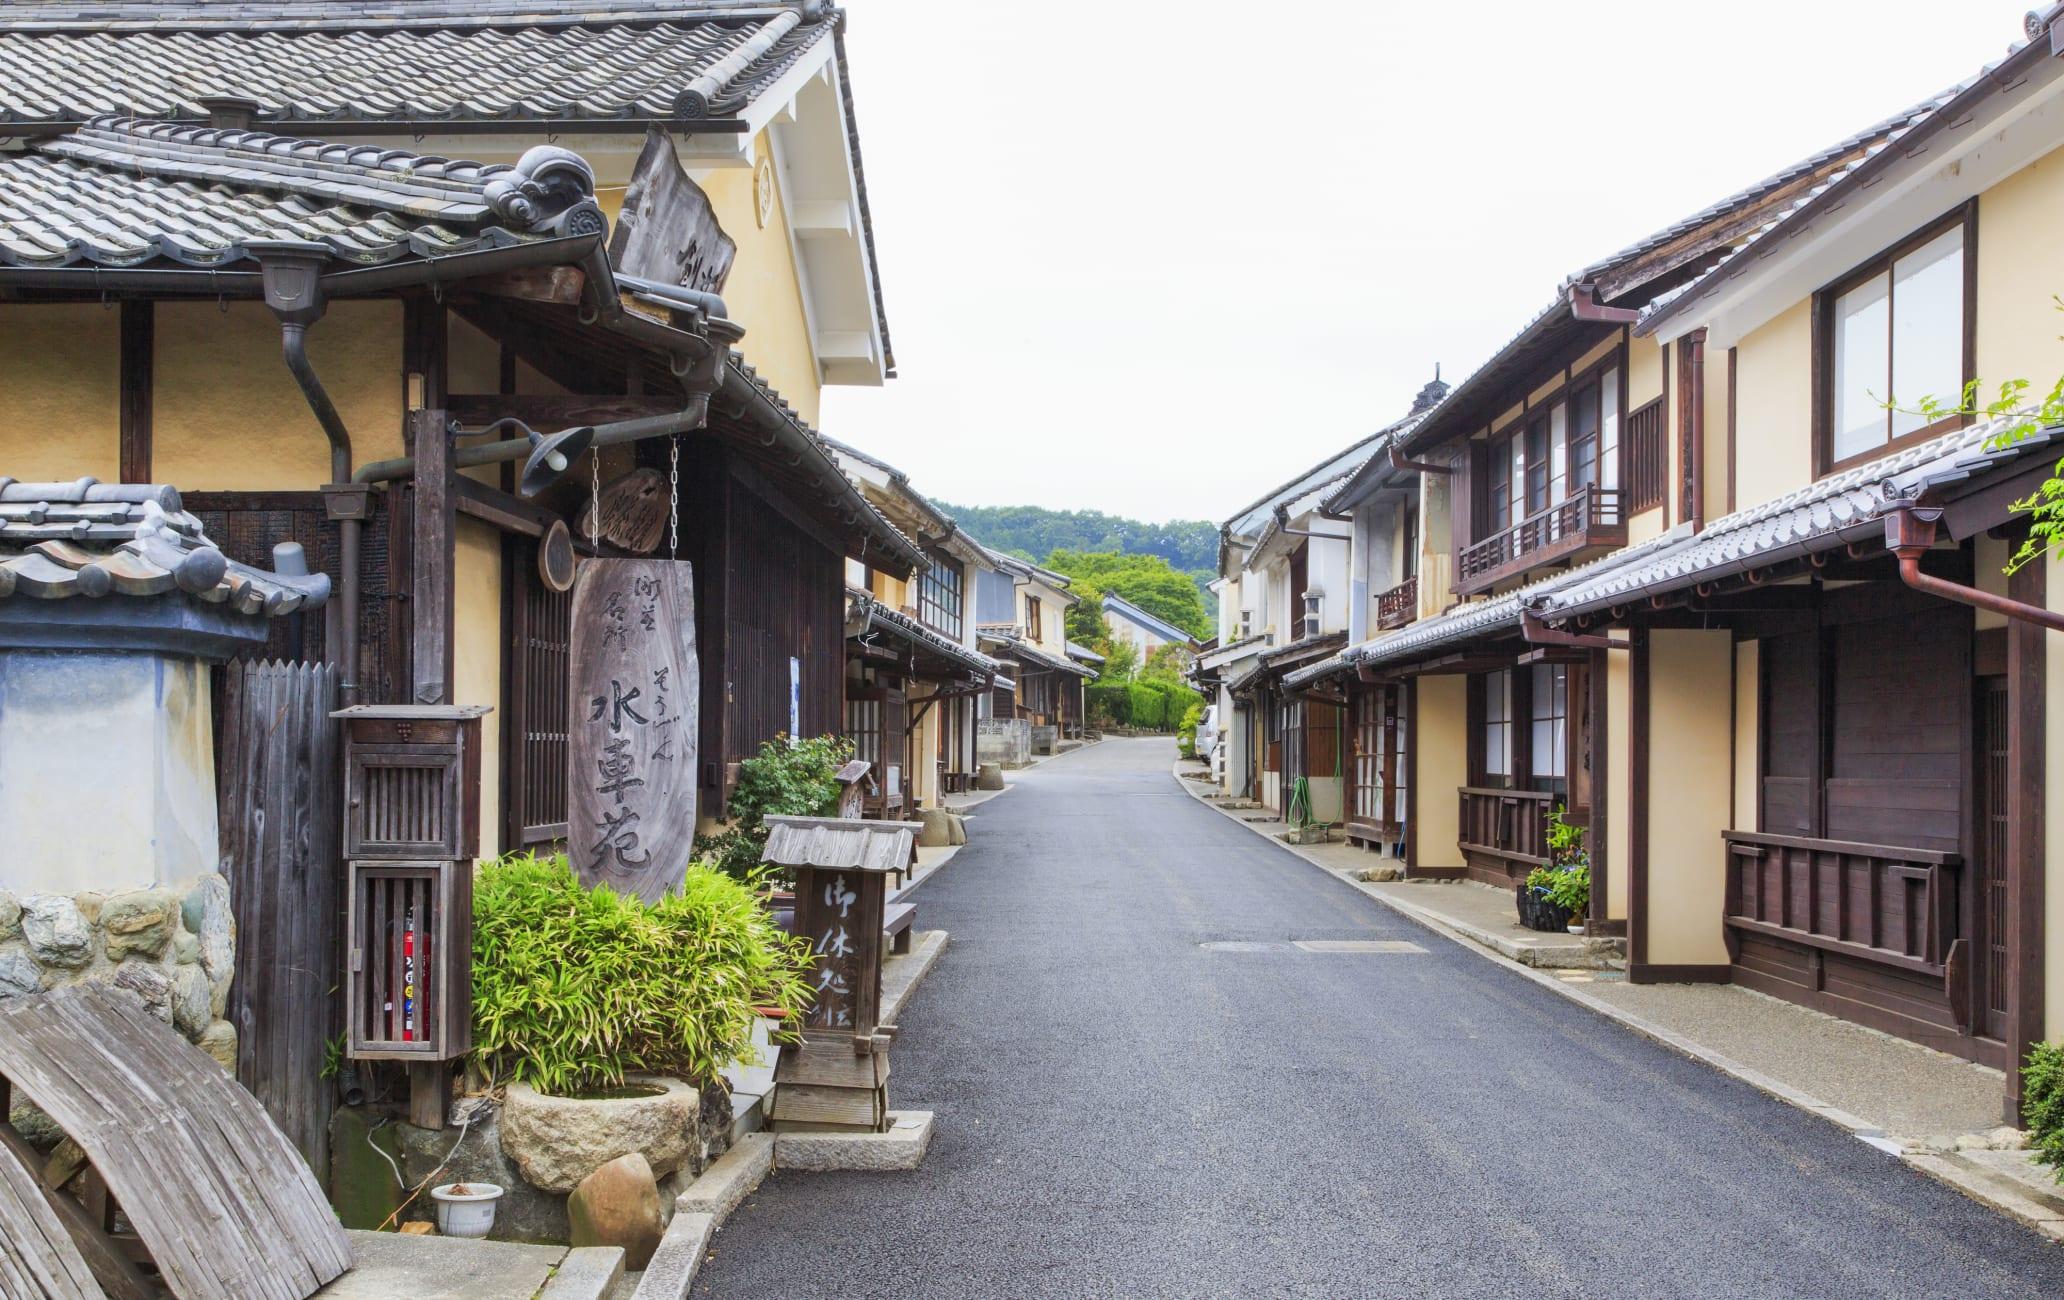 Youkaichi Gokoku Streetscape Preservation Center